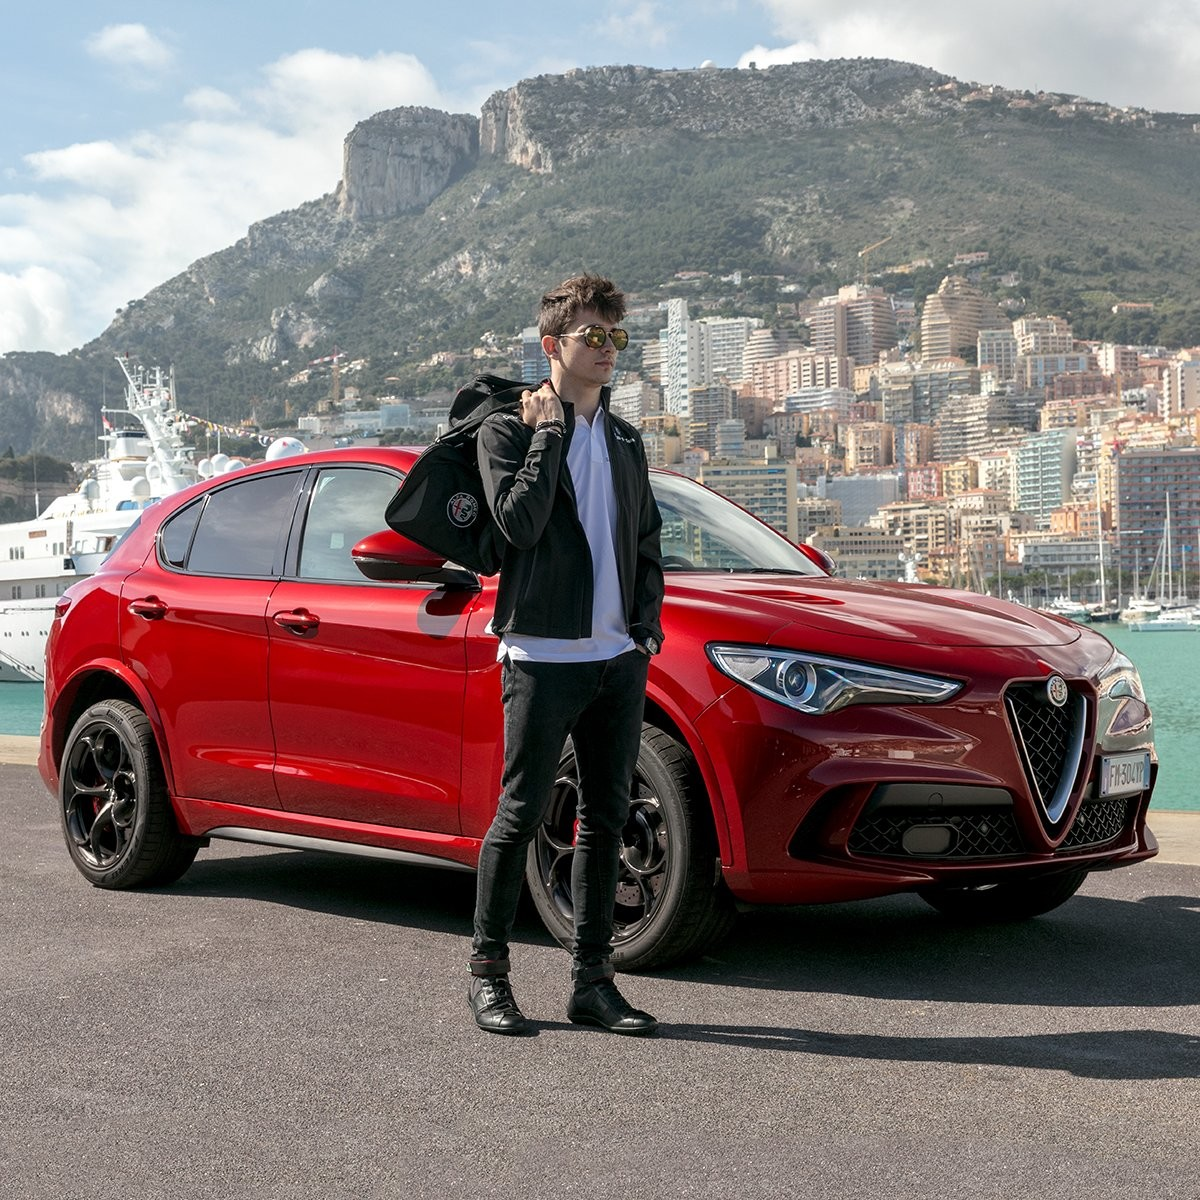 Foto de Alfa Romeo Stelvio y Charles LeClerc en Mónaco (1/8)